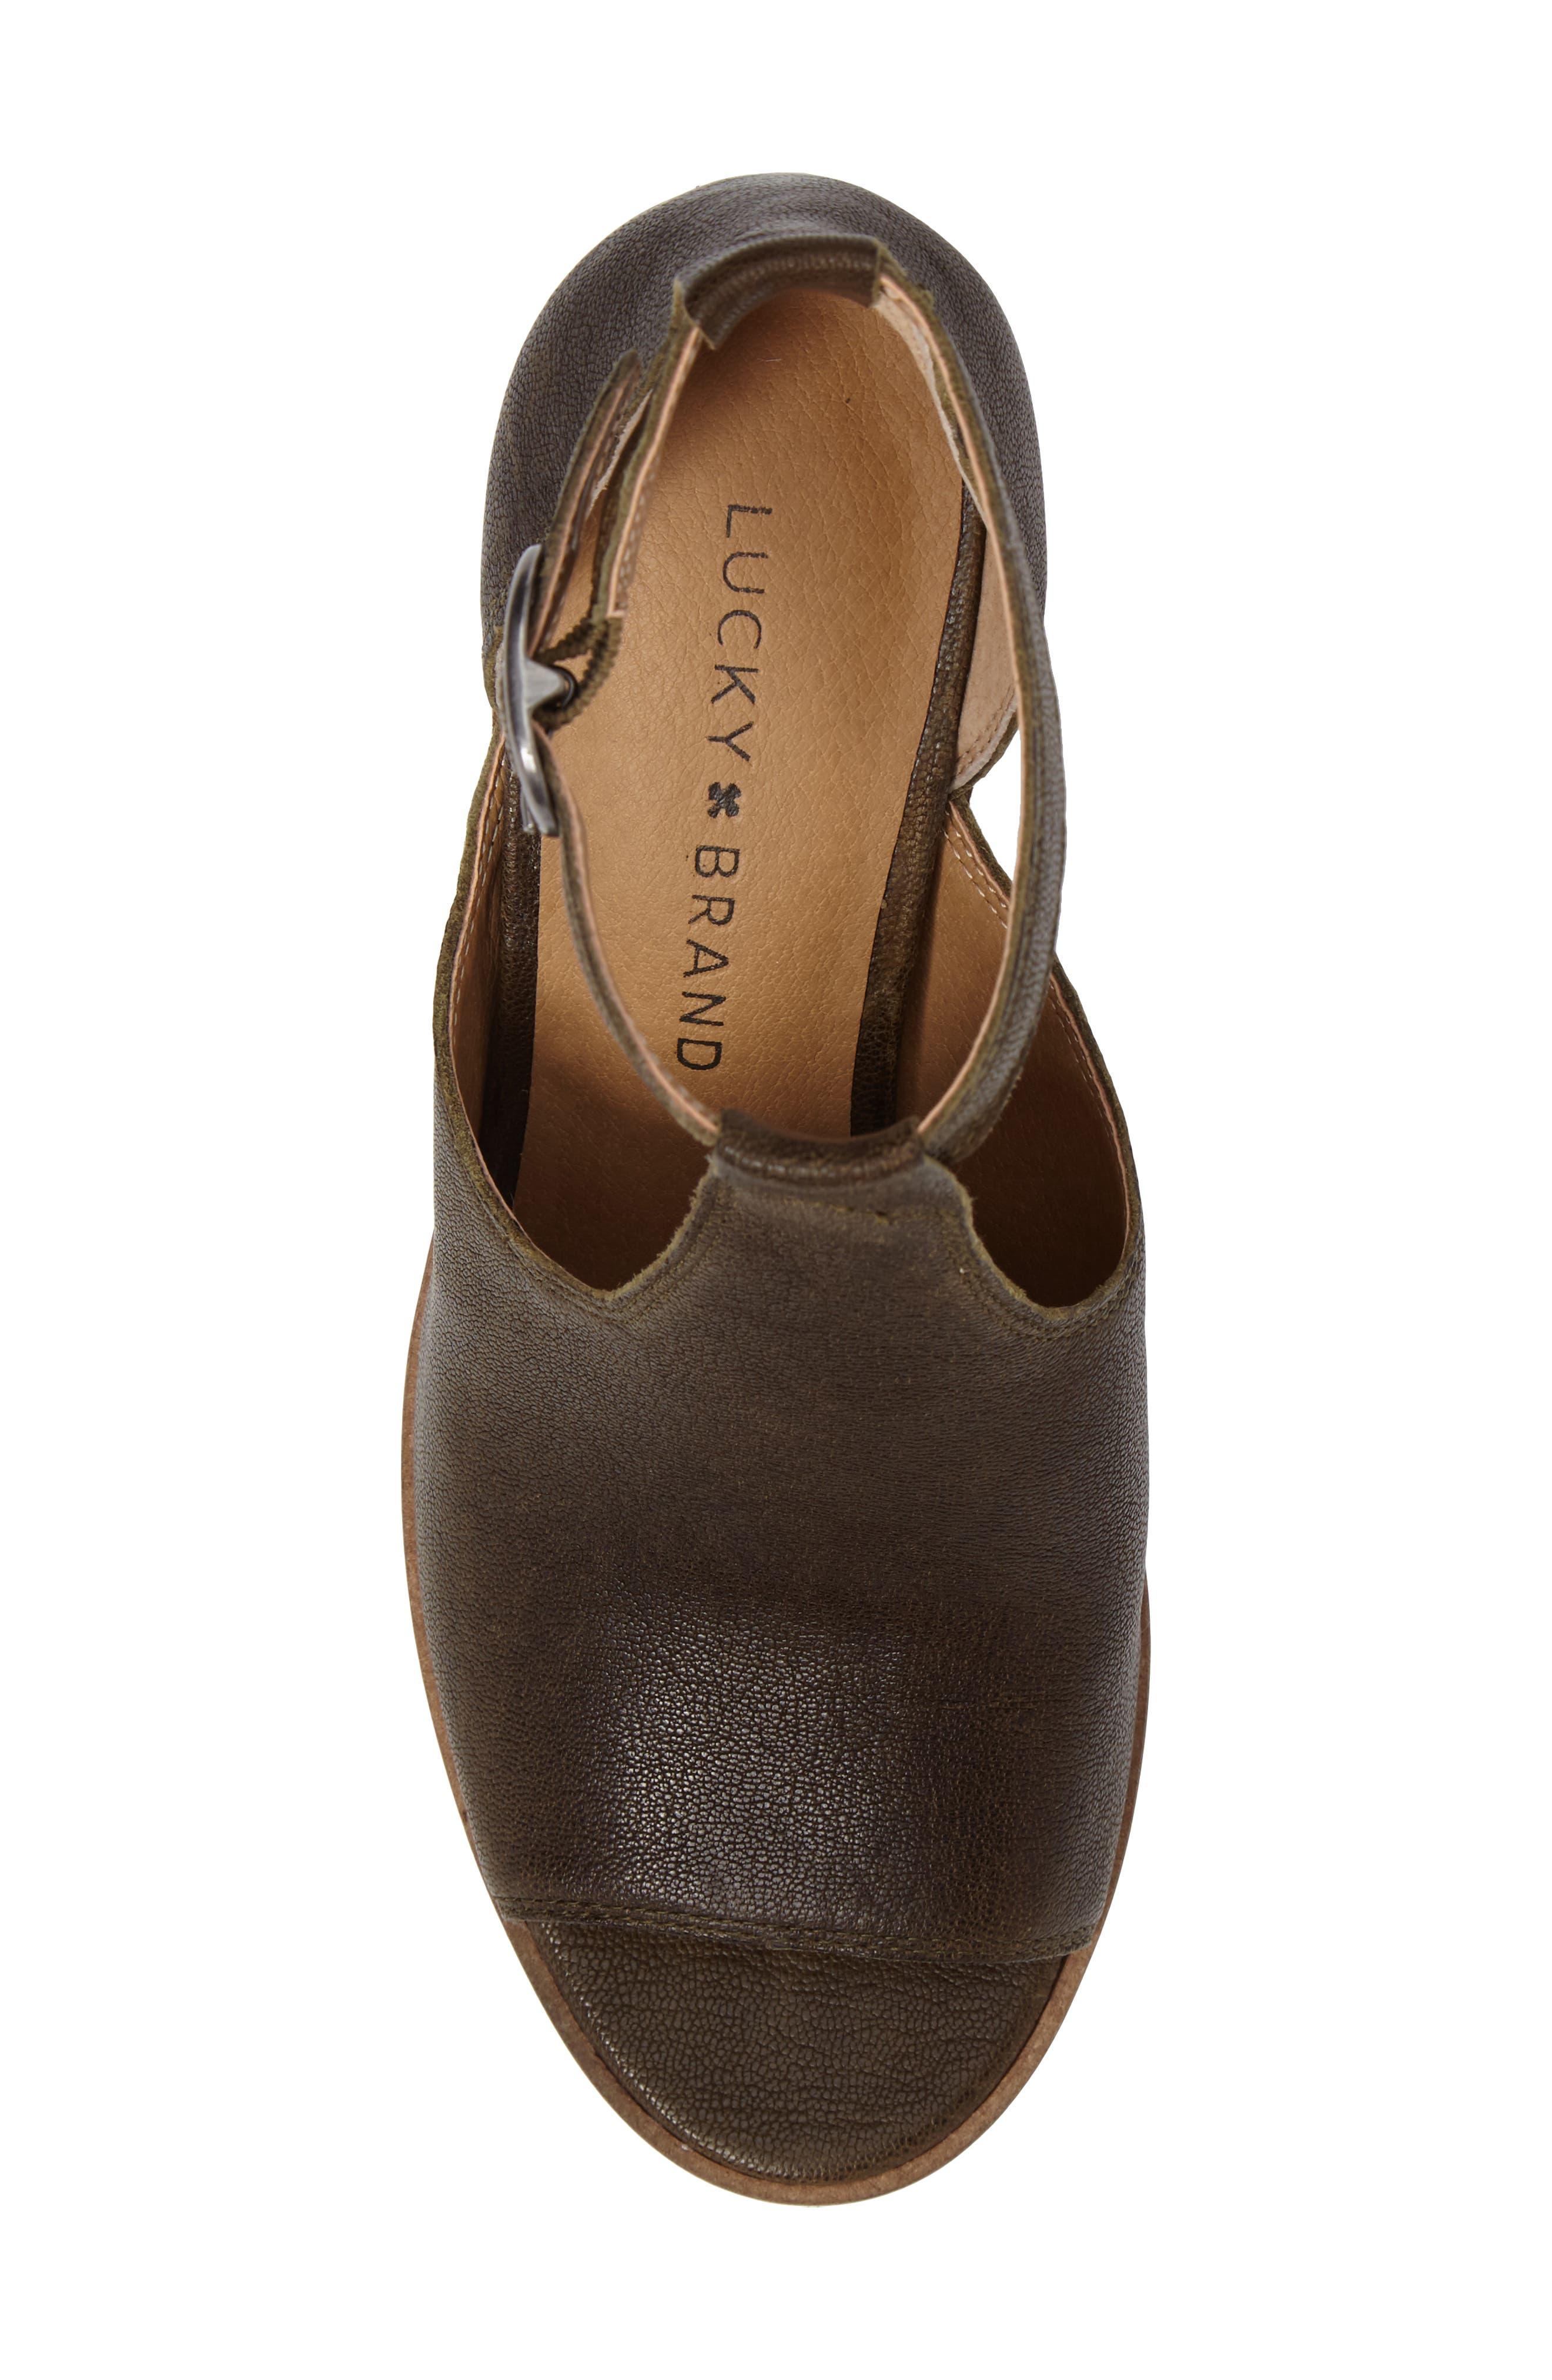 Kadian Block Heel Sandal,                             Alternate thumbnail 10, color,